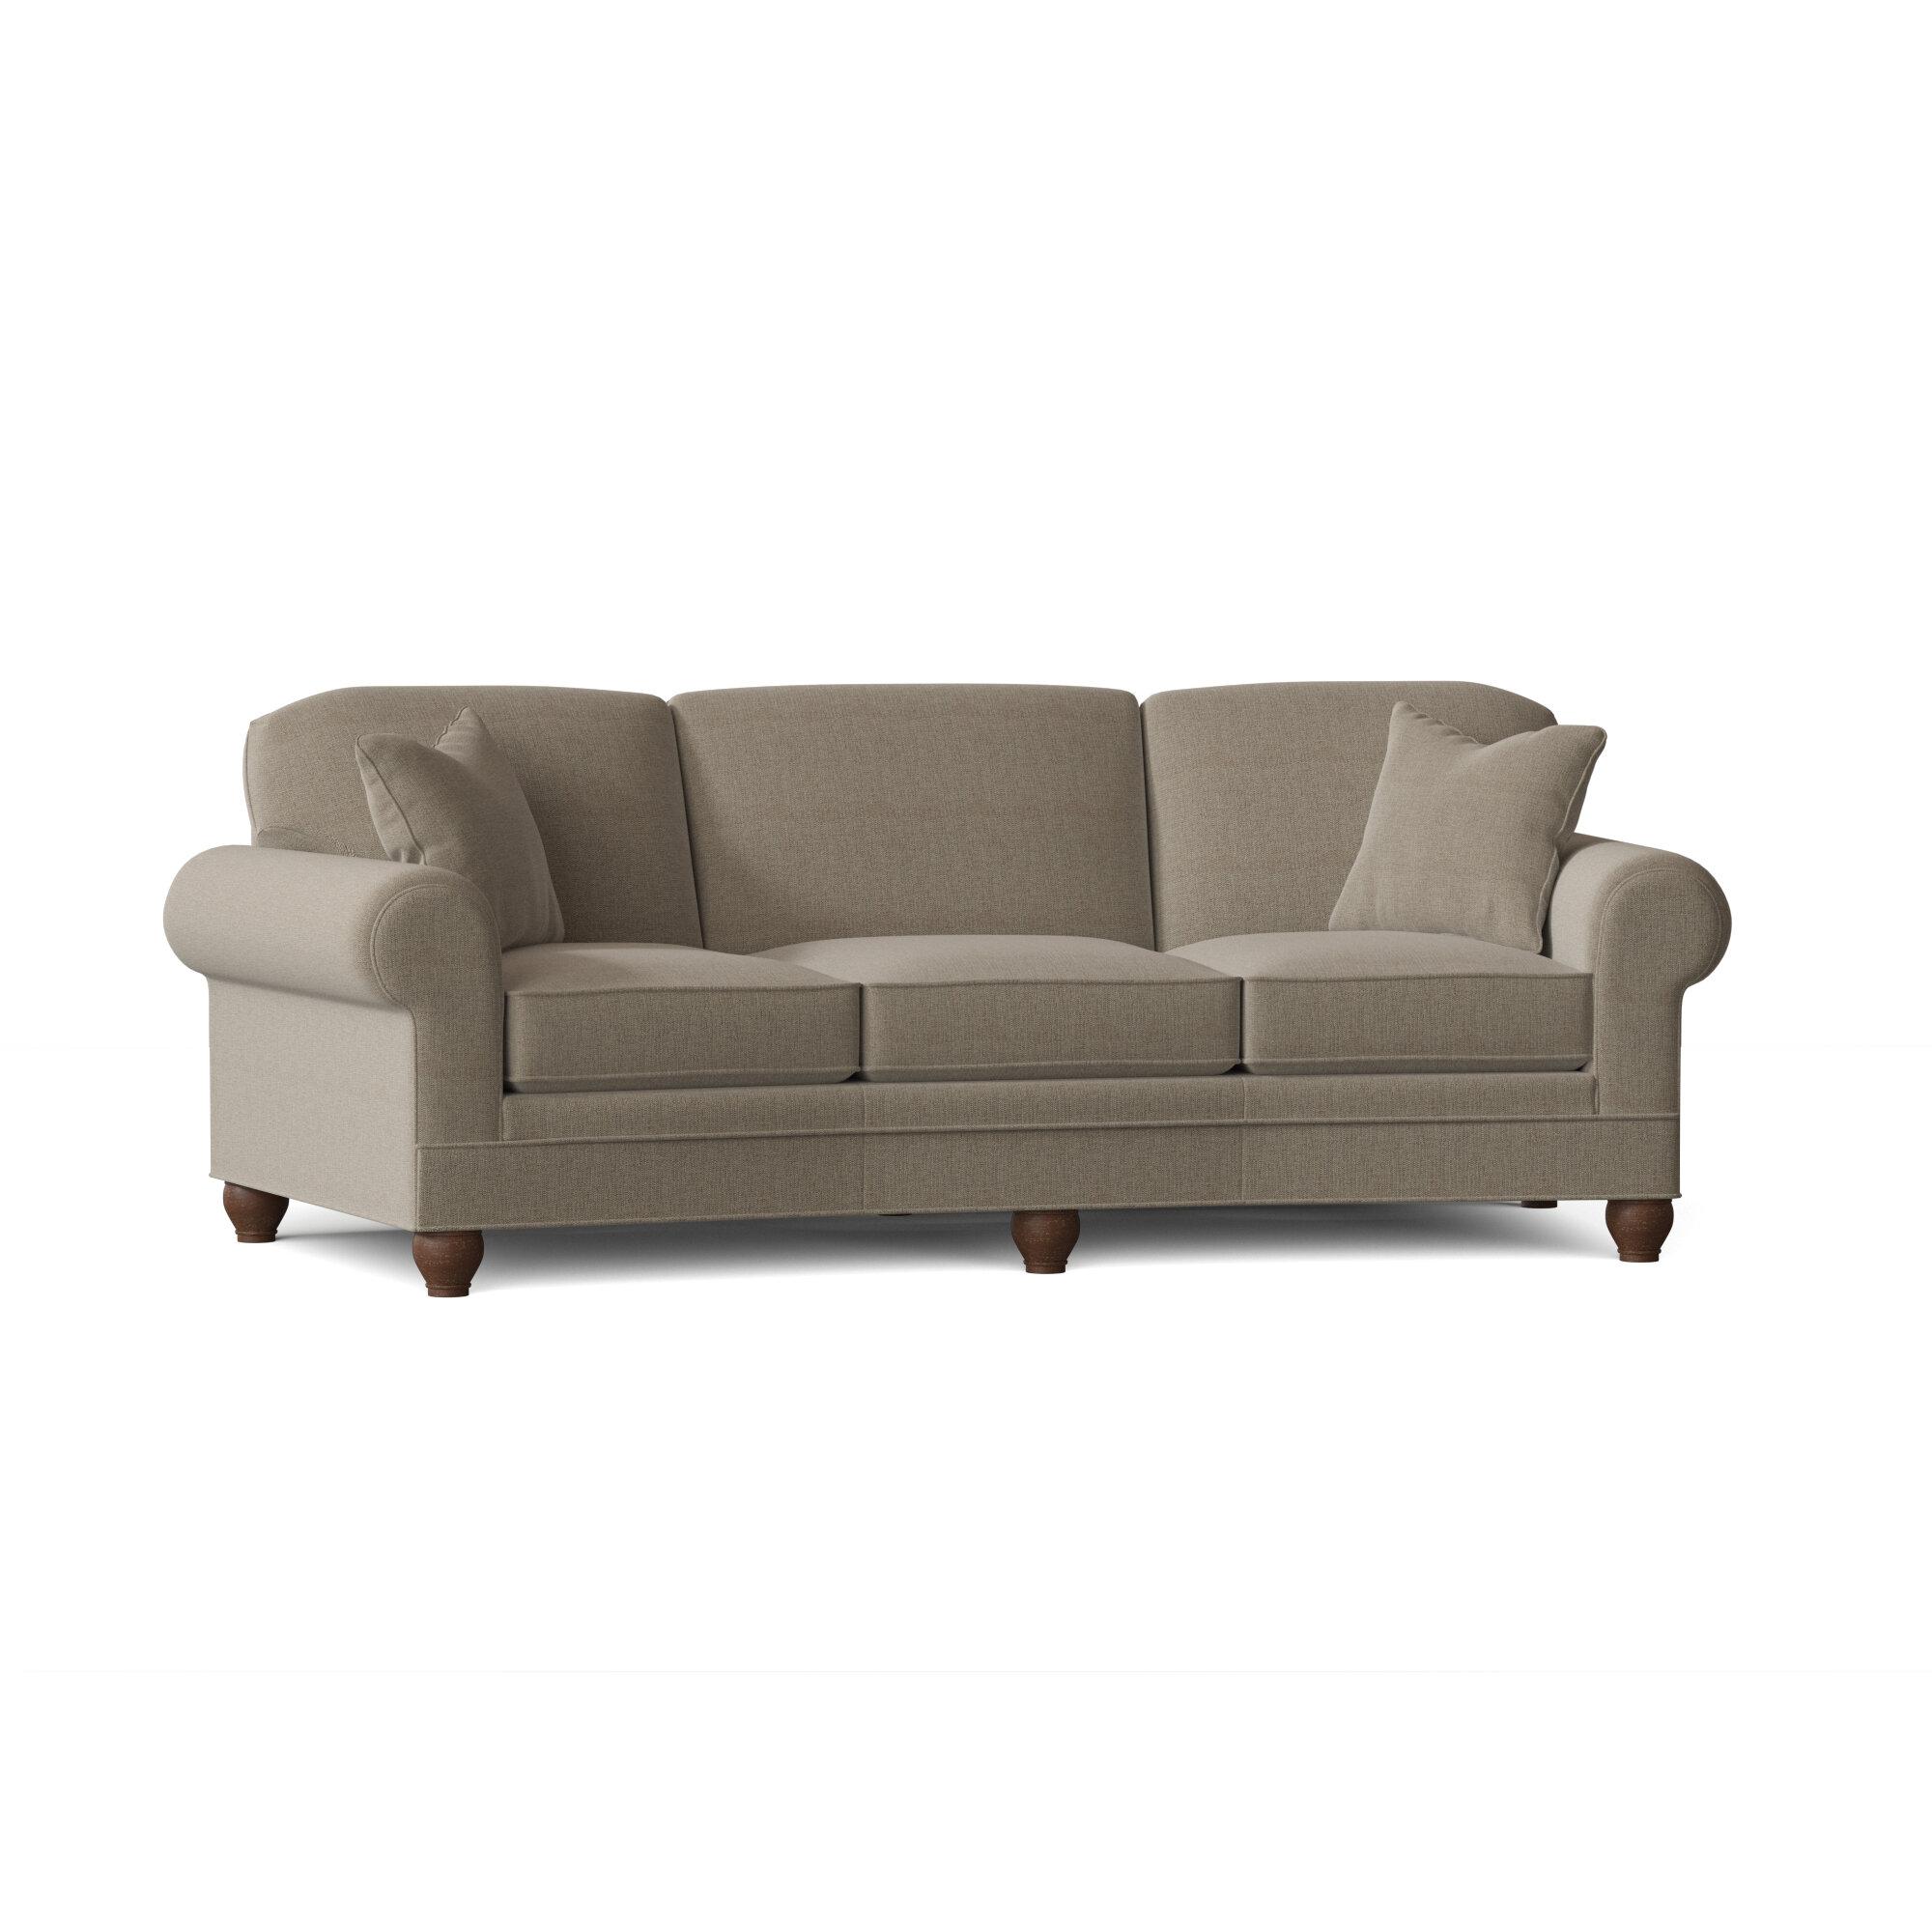 Fairfield Chair Crosby Curved 100 Rolled Arm Sofa Perigold